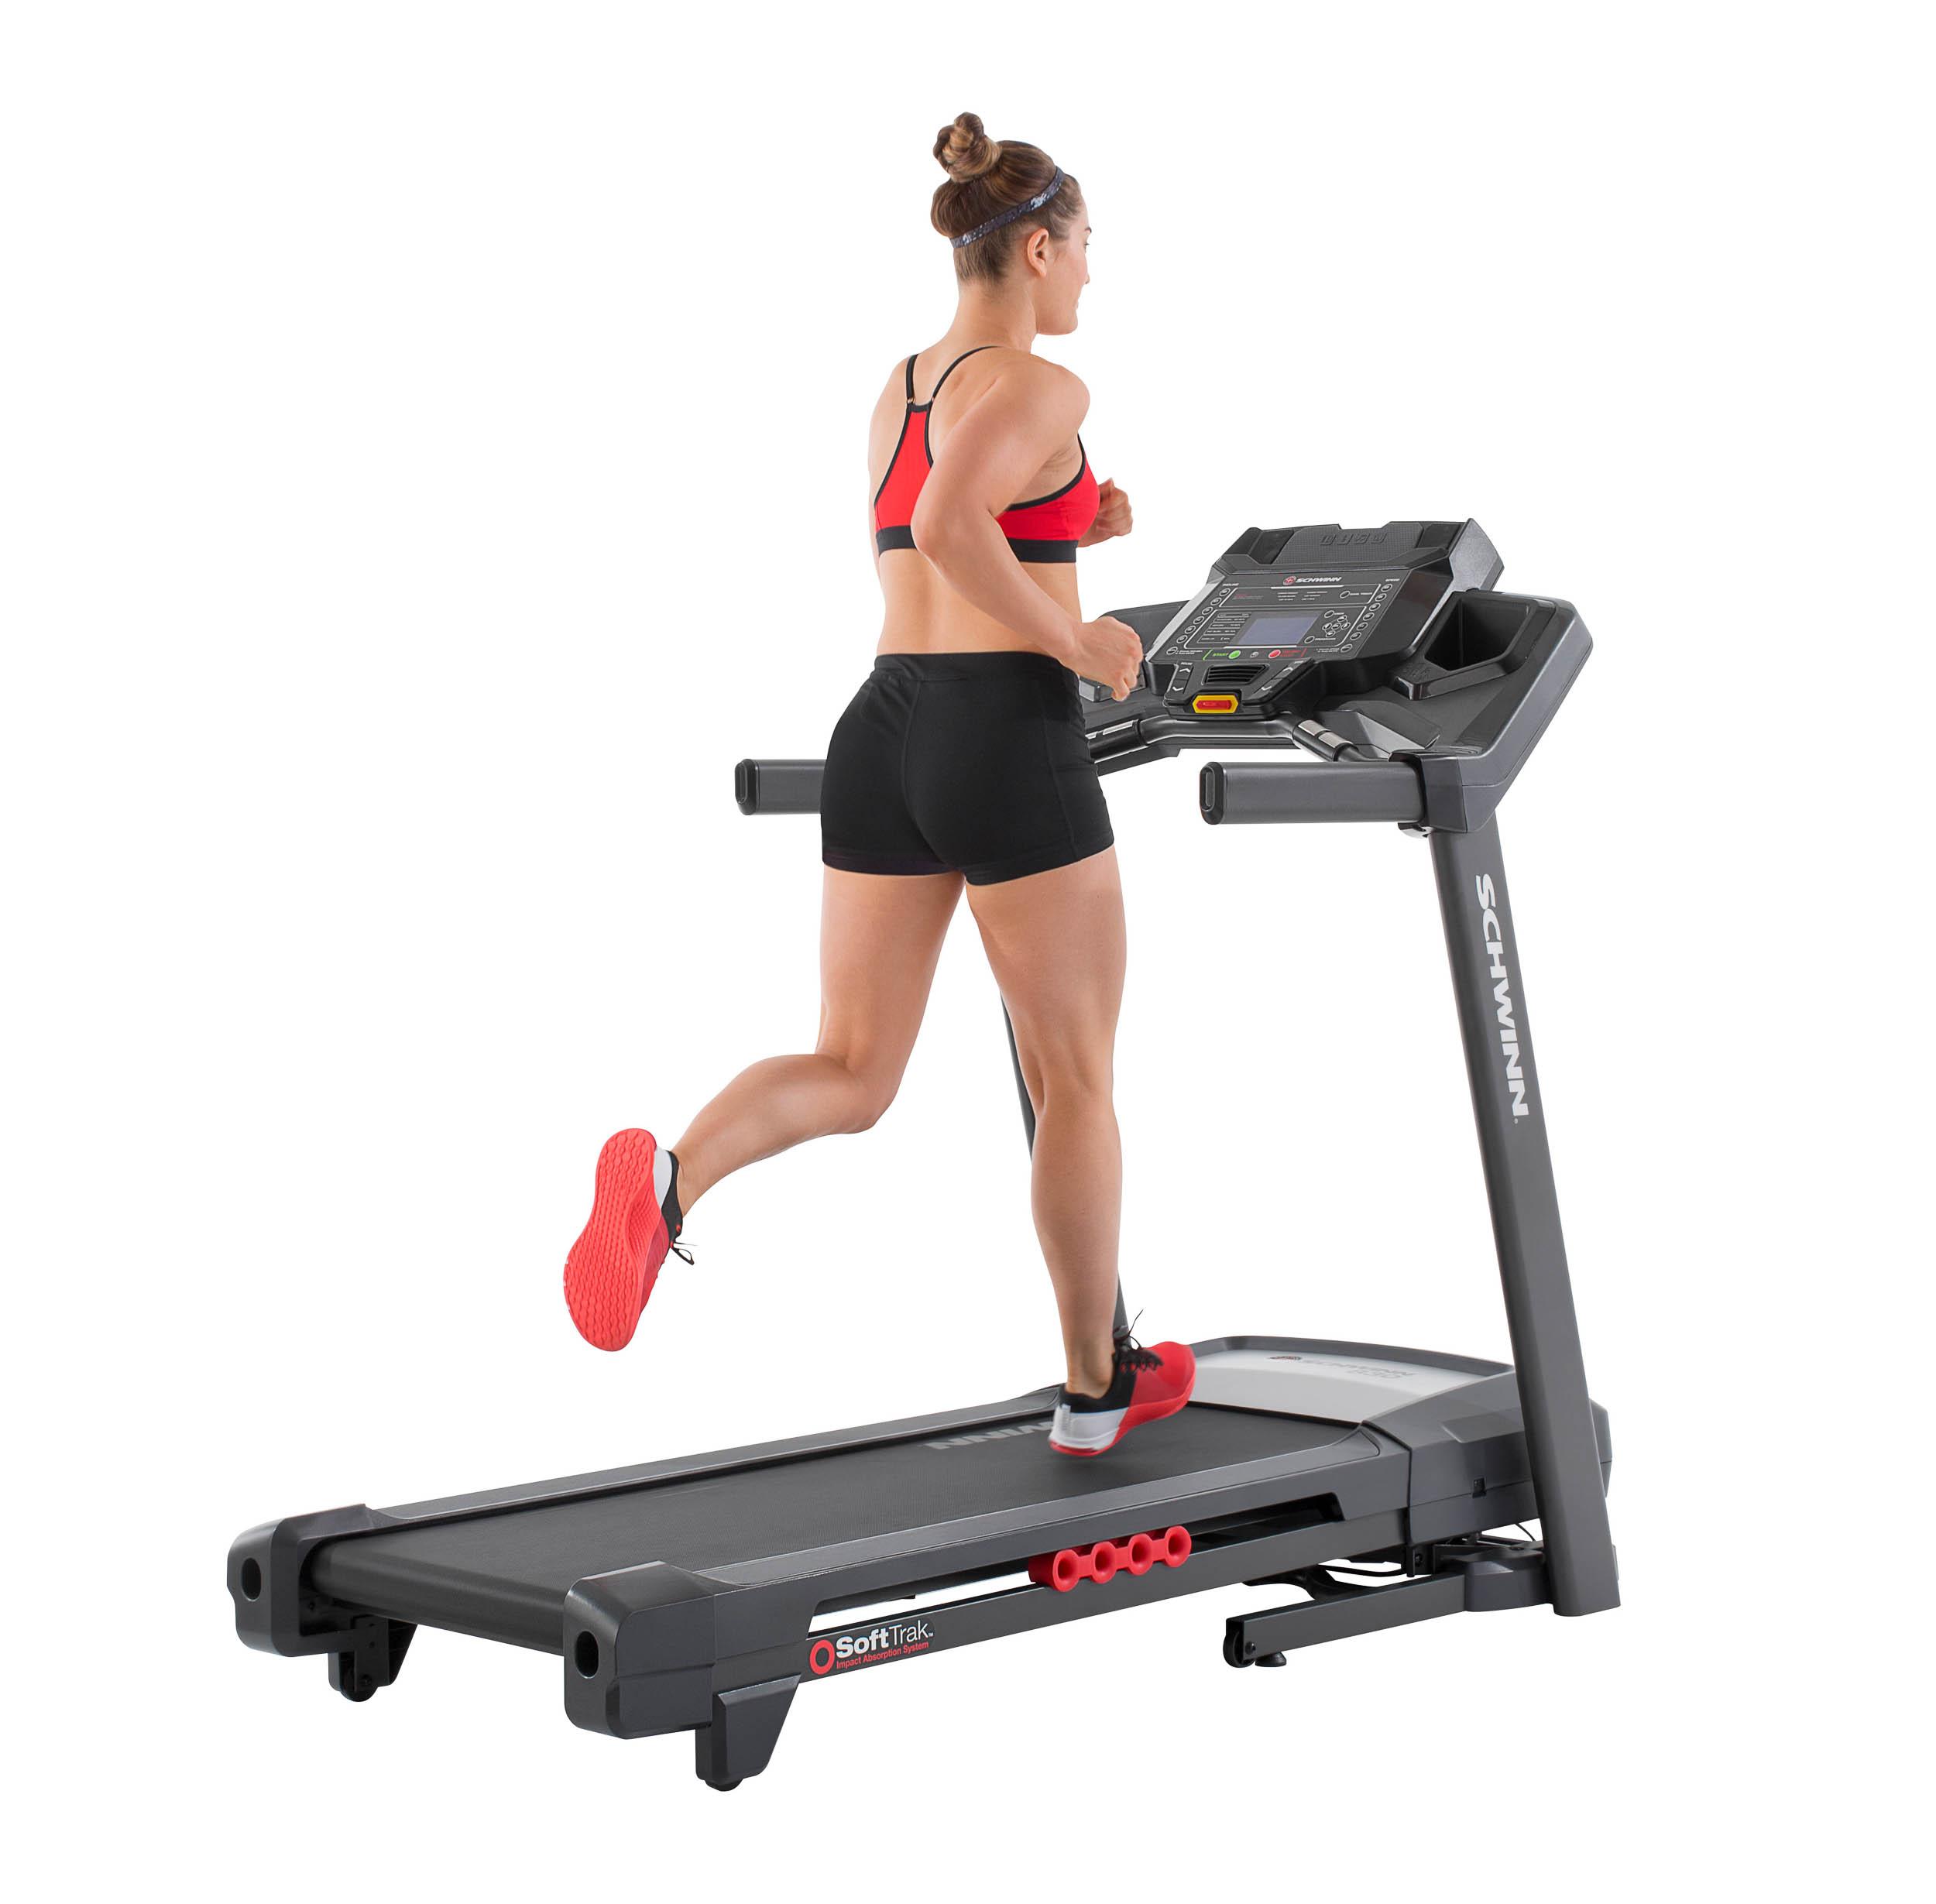 Nautilus_Direct_116099_Schwinn Treadmill 830 Studio Rear 3-4 Julie_124 copy.jpg